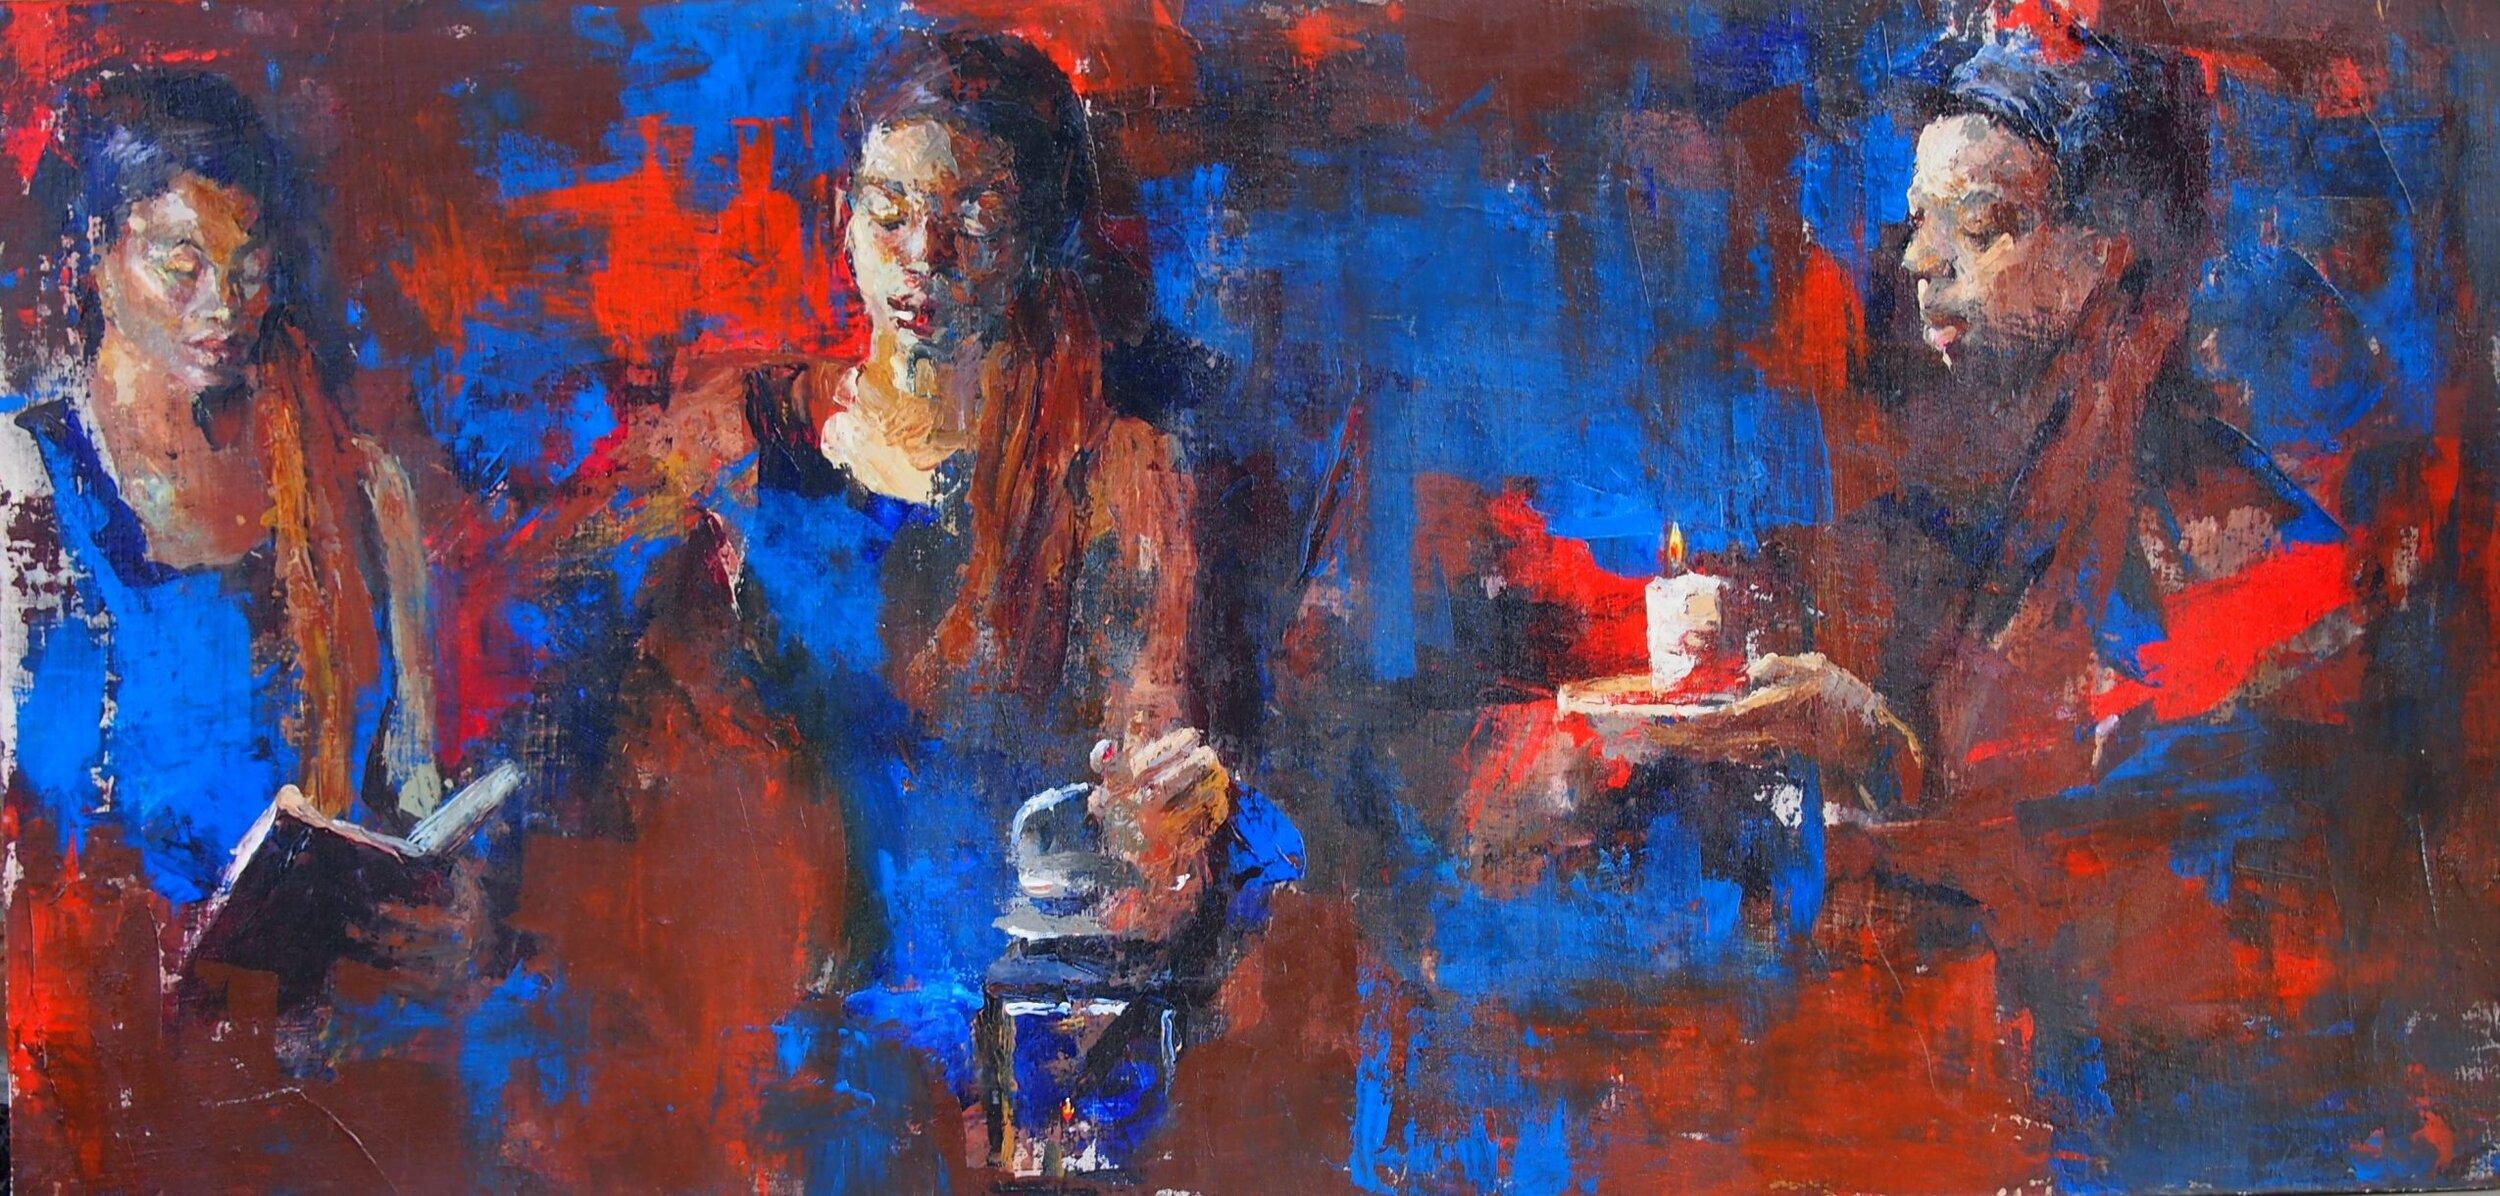 THE_ART_OF_GIVIN Hilda Rueda.jpg